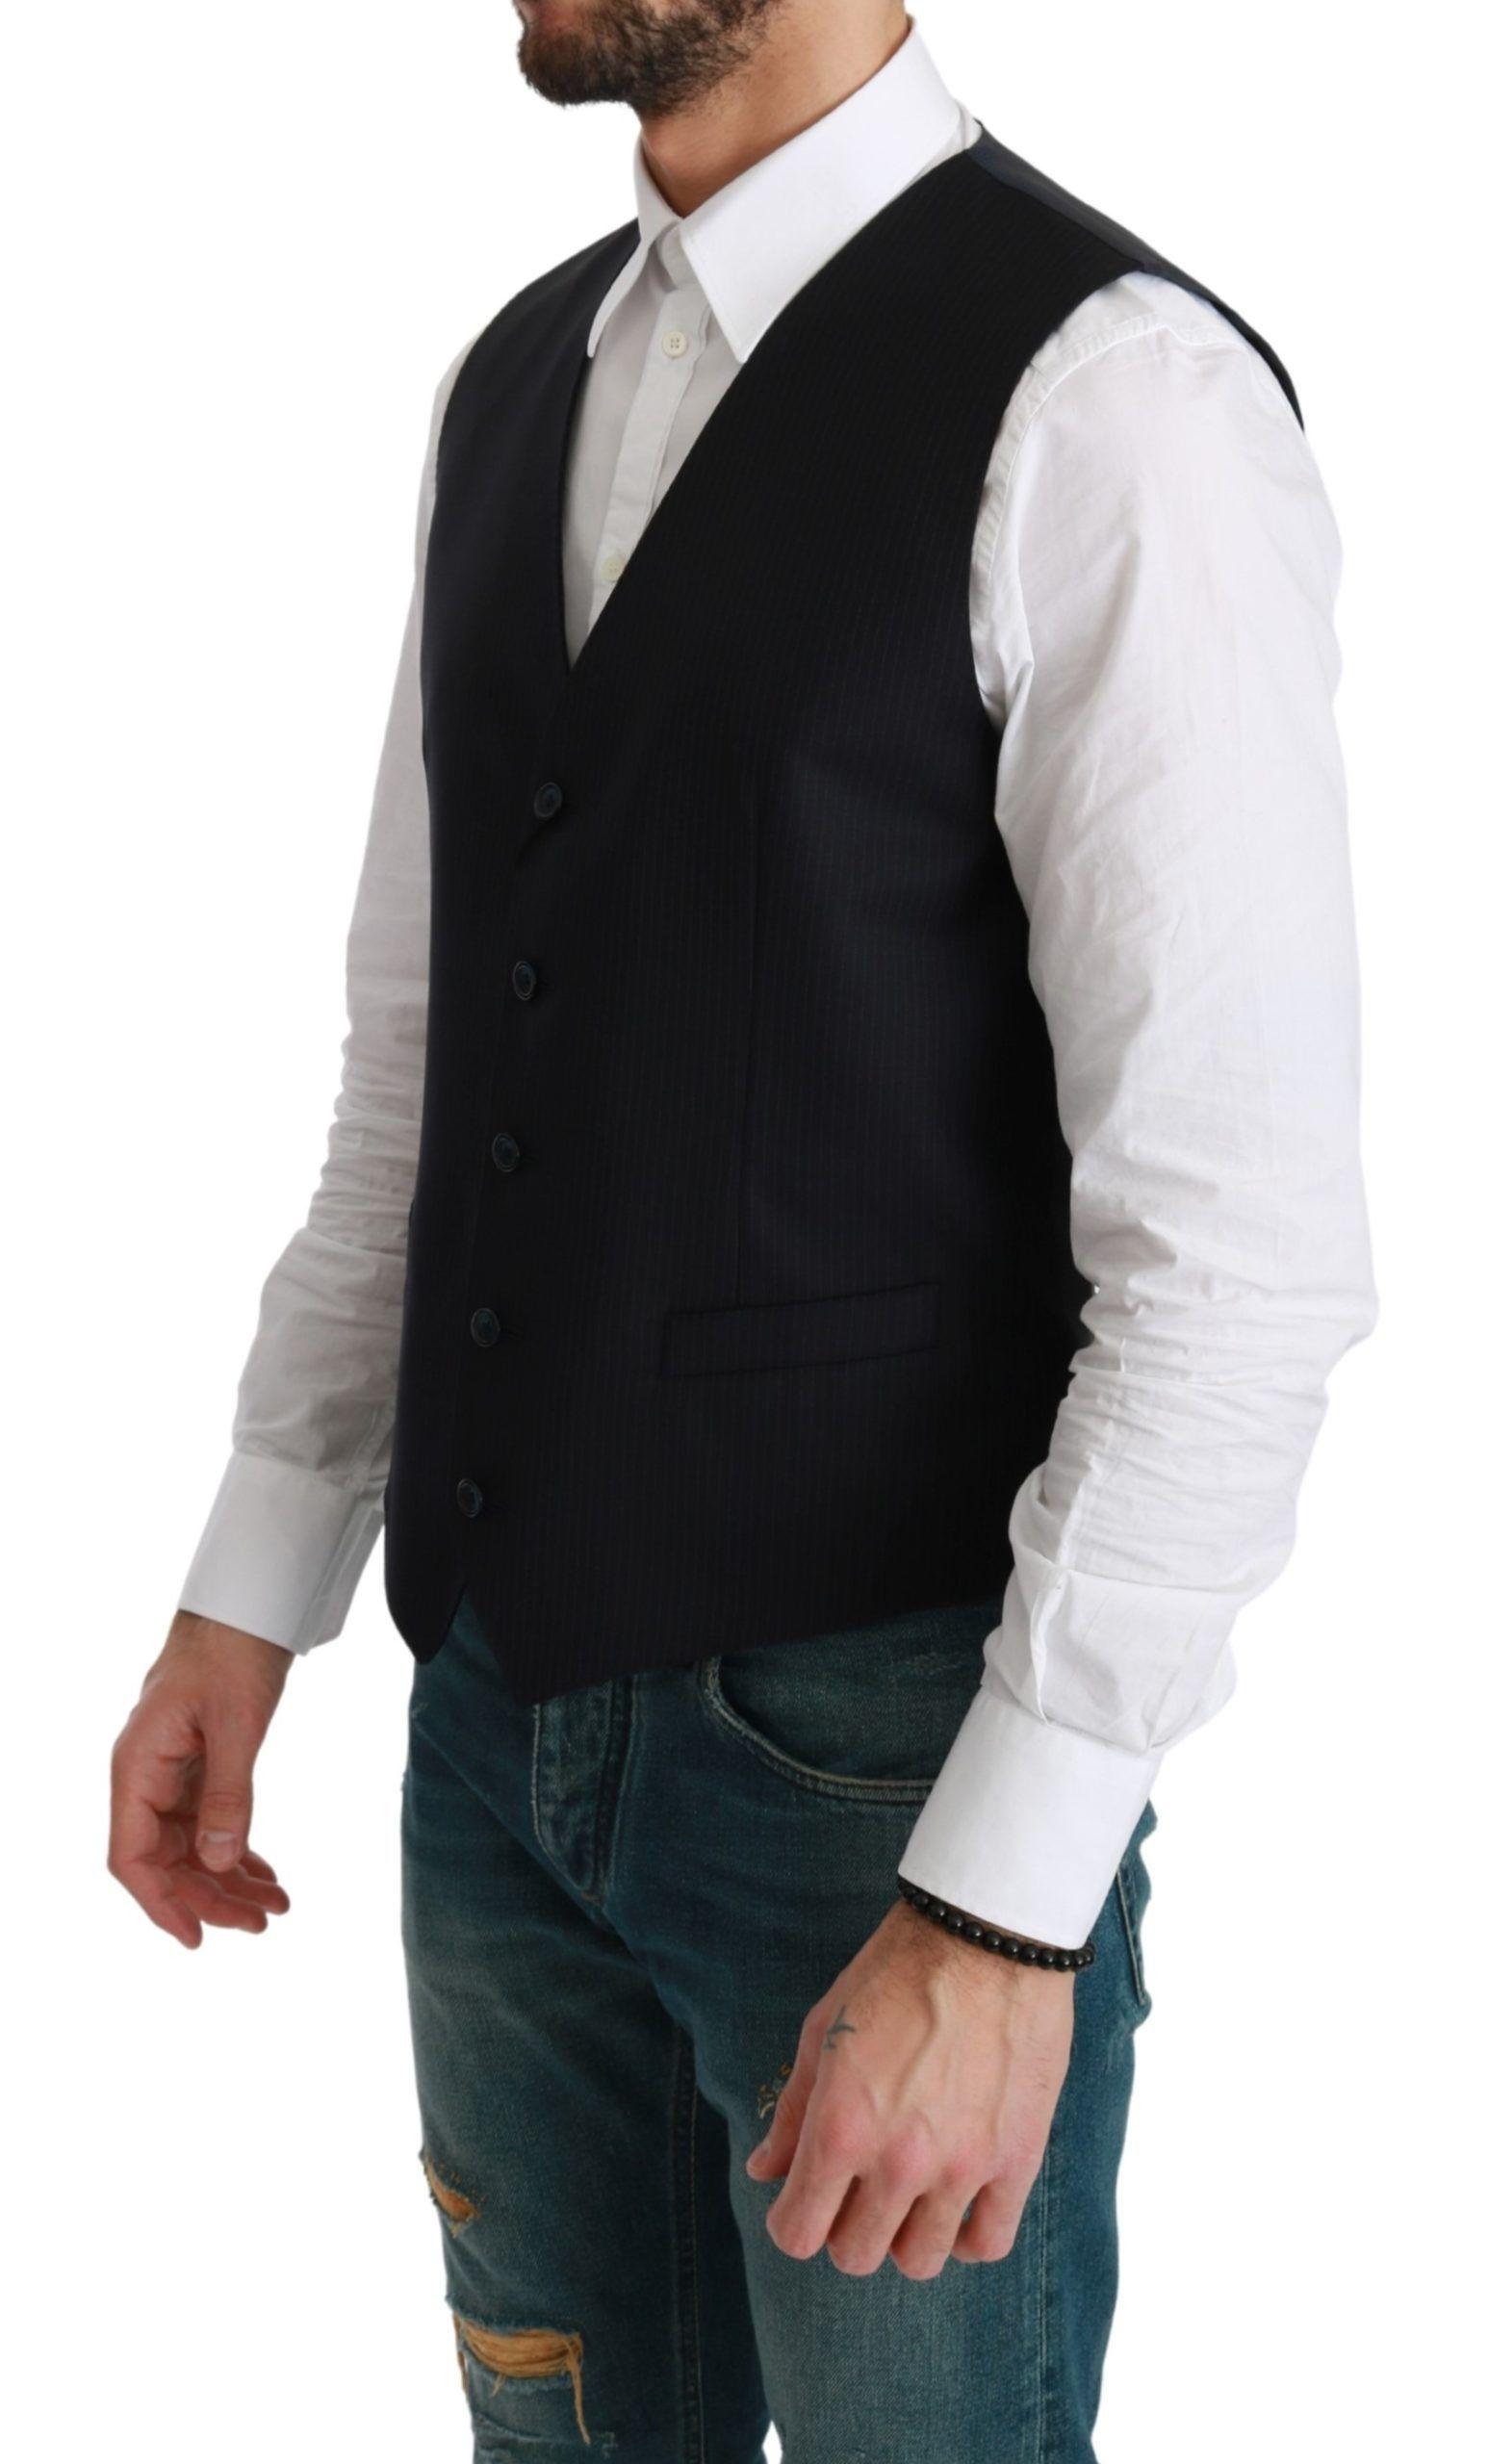 Dolce & Gabbana Blue Waistcoat Formal Stretch Wool Vest